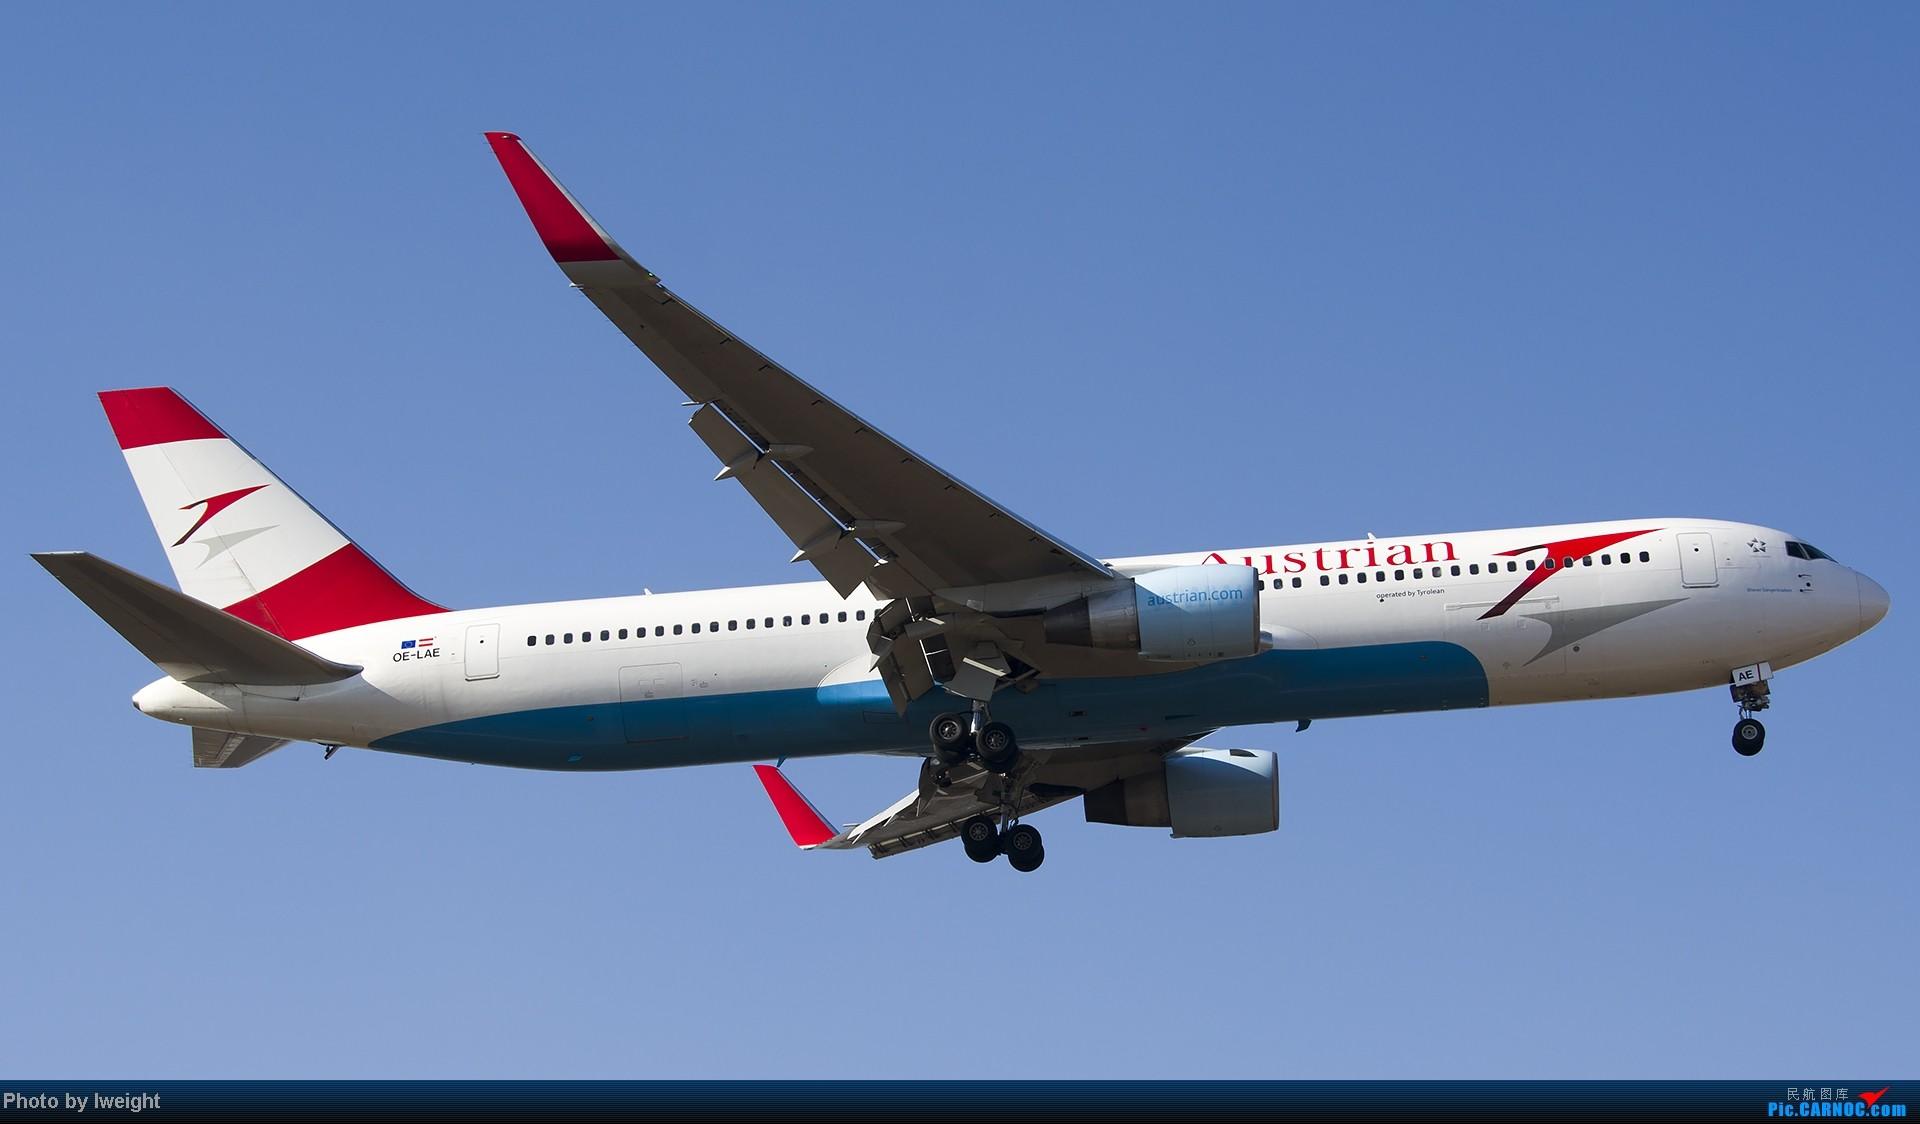 Re:[原创]抓住APEC蓝的尾巴,再拍上一组 BOEING 767-300ER OE-LAE 中国北京首都机场